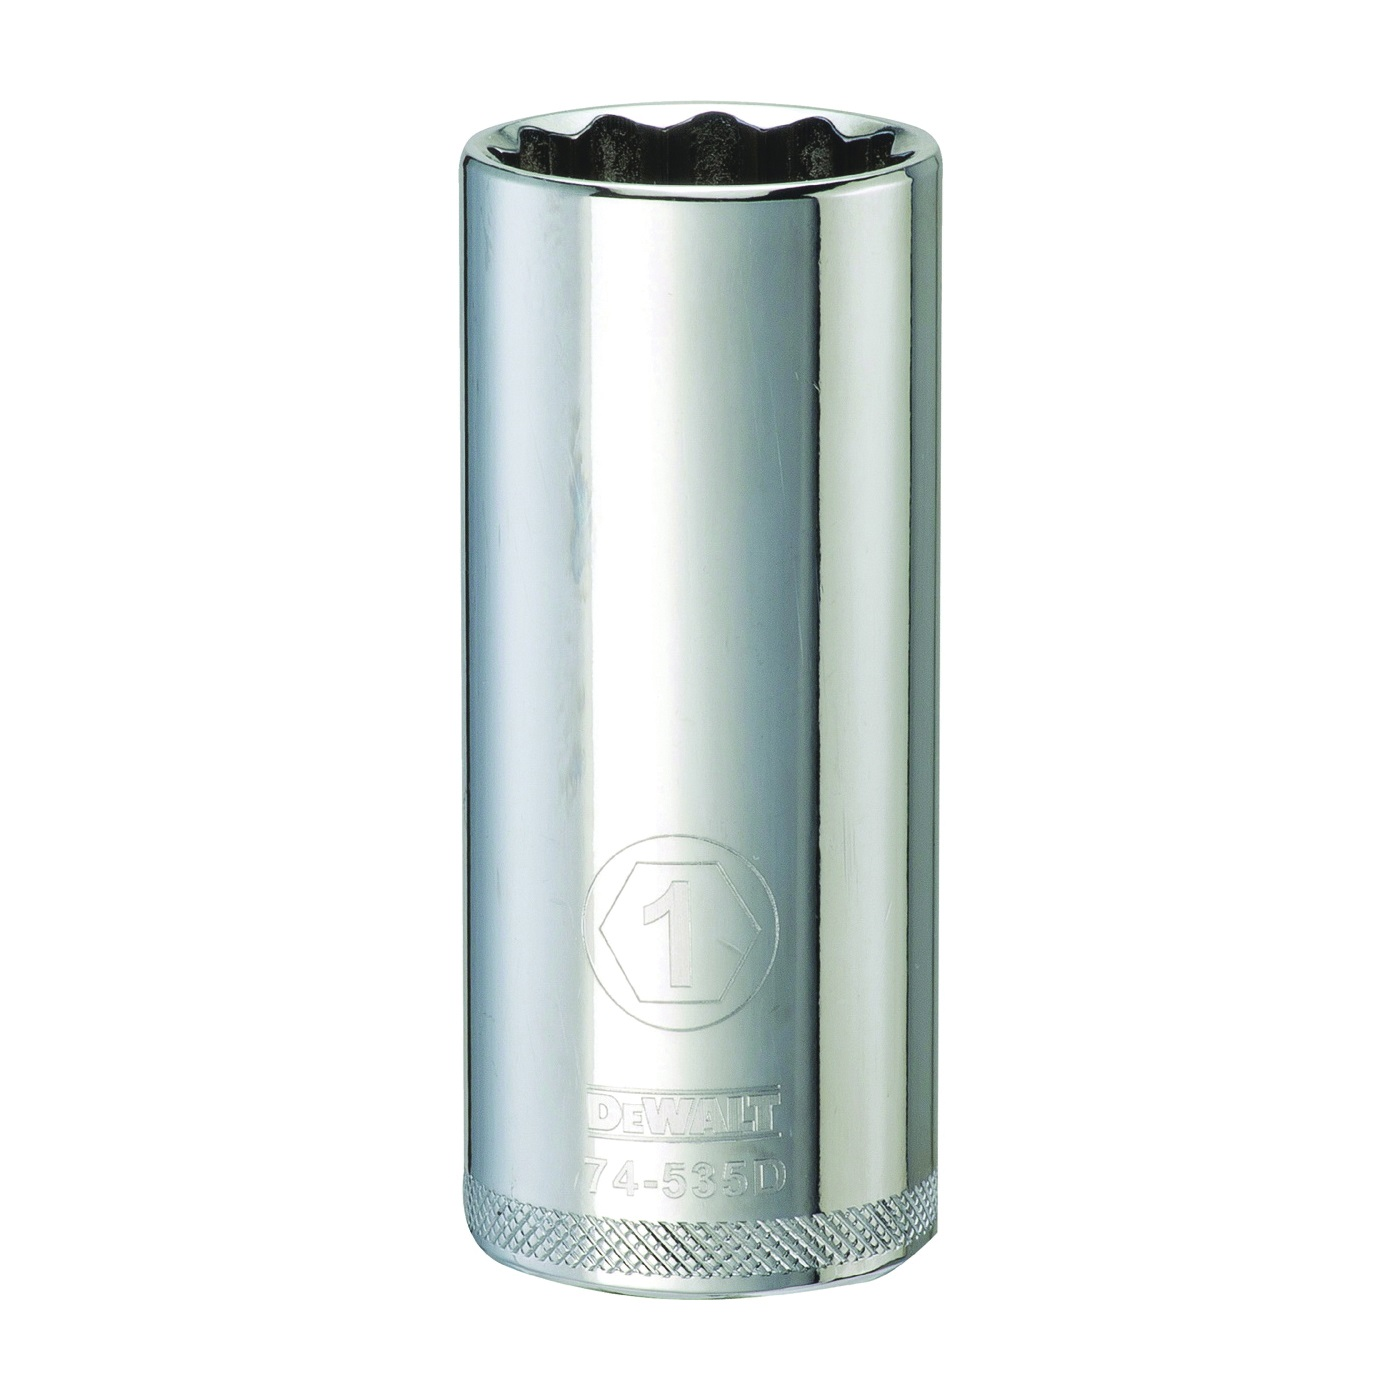 Picture of DeWALT DWMT74535OSP Drive Socket, 1 in Socket, 1/2 in Drive, 12 -Point, Vanadium Steel, Polished Chrome